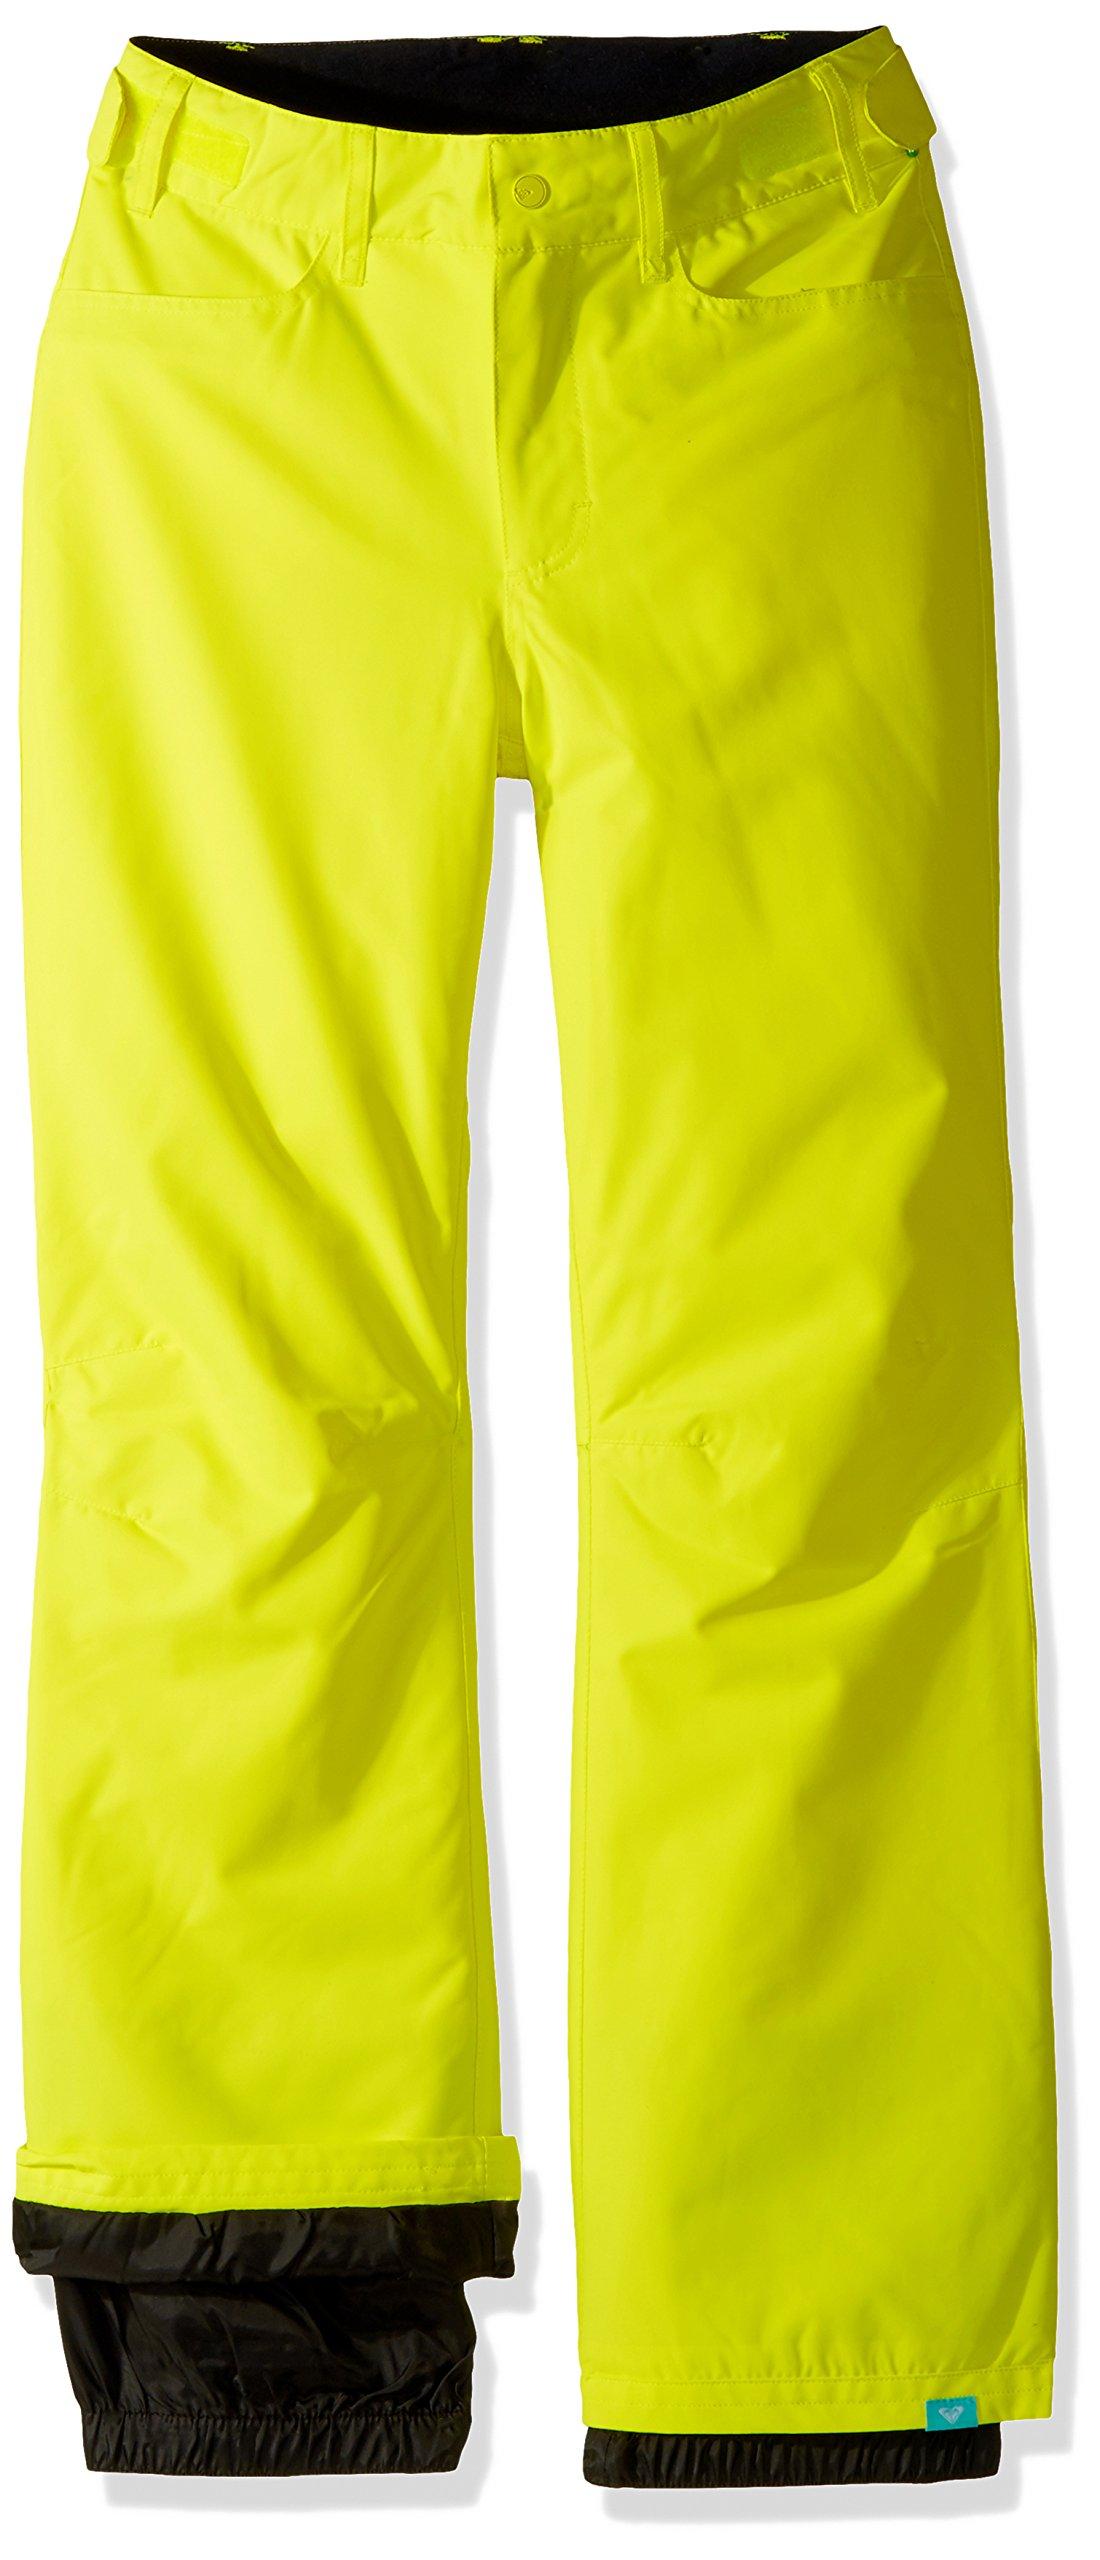 Roxy Big Girls' Backyard Snow Pant, Lemon Tonic, 16/XXL